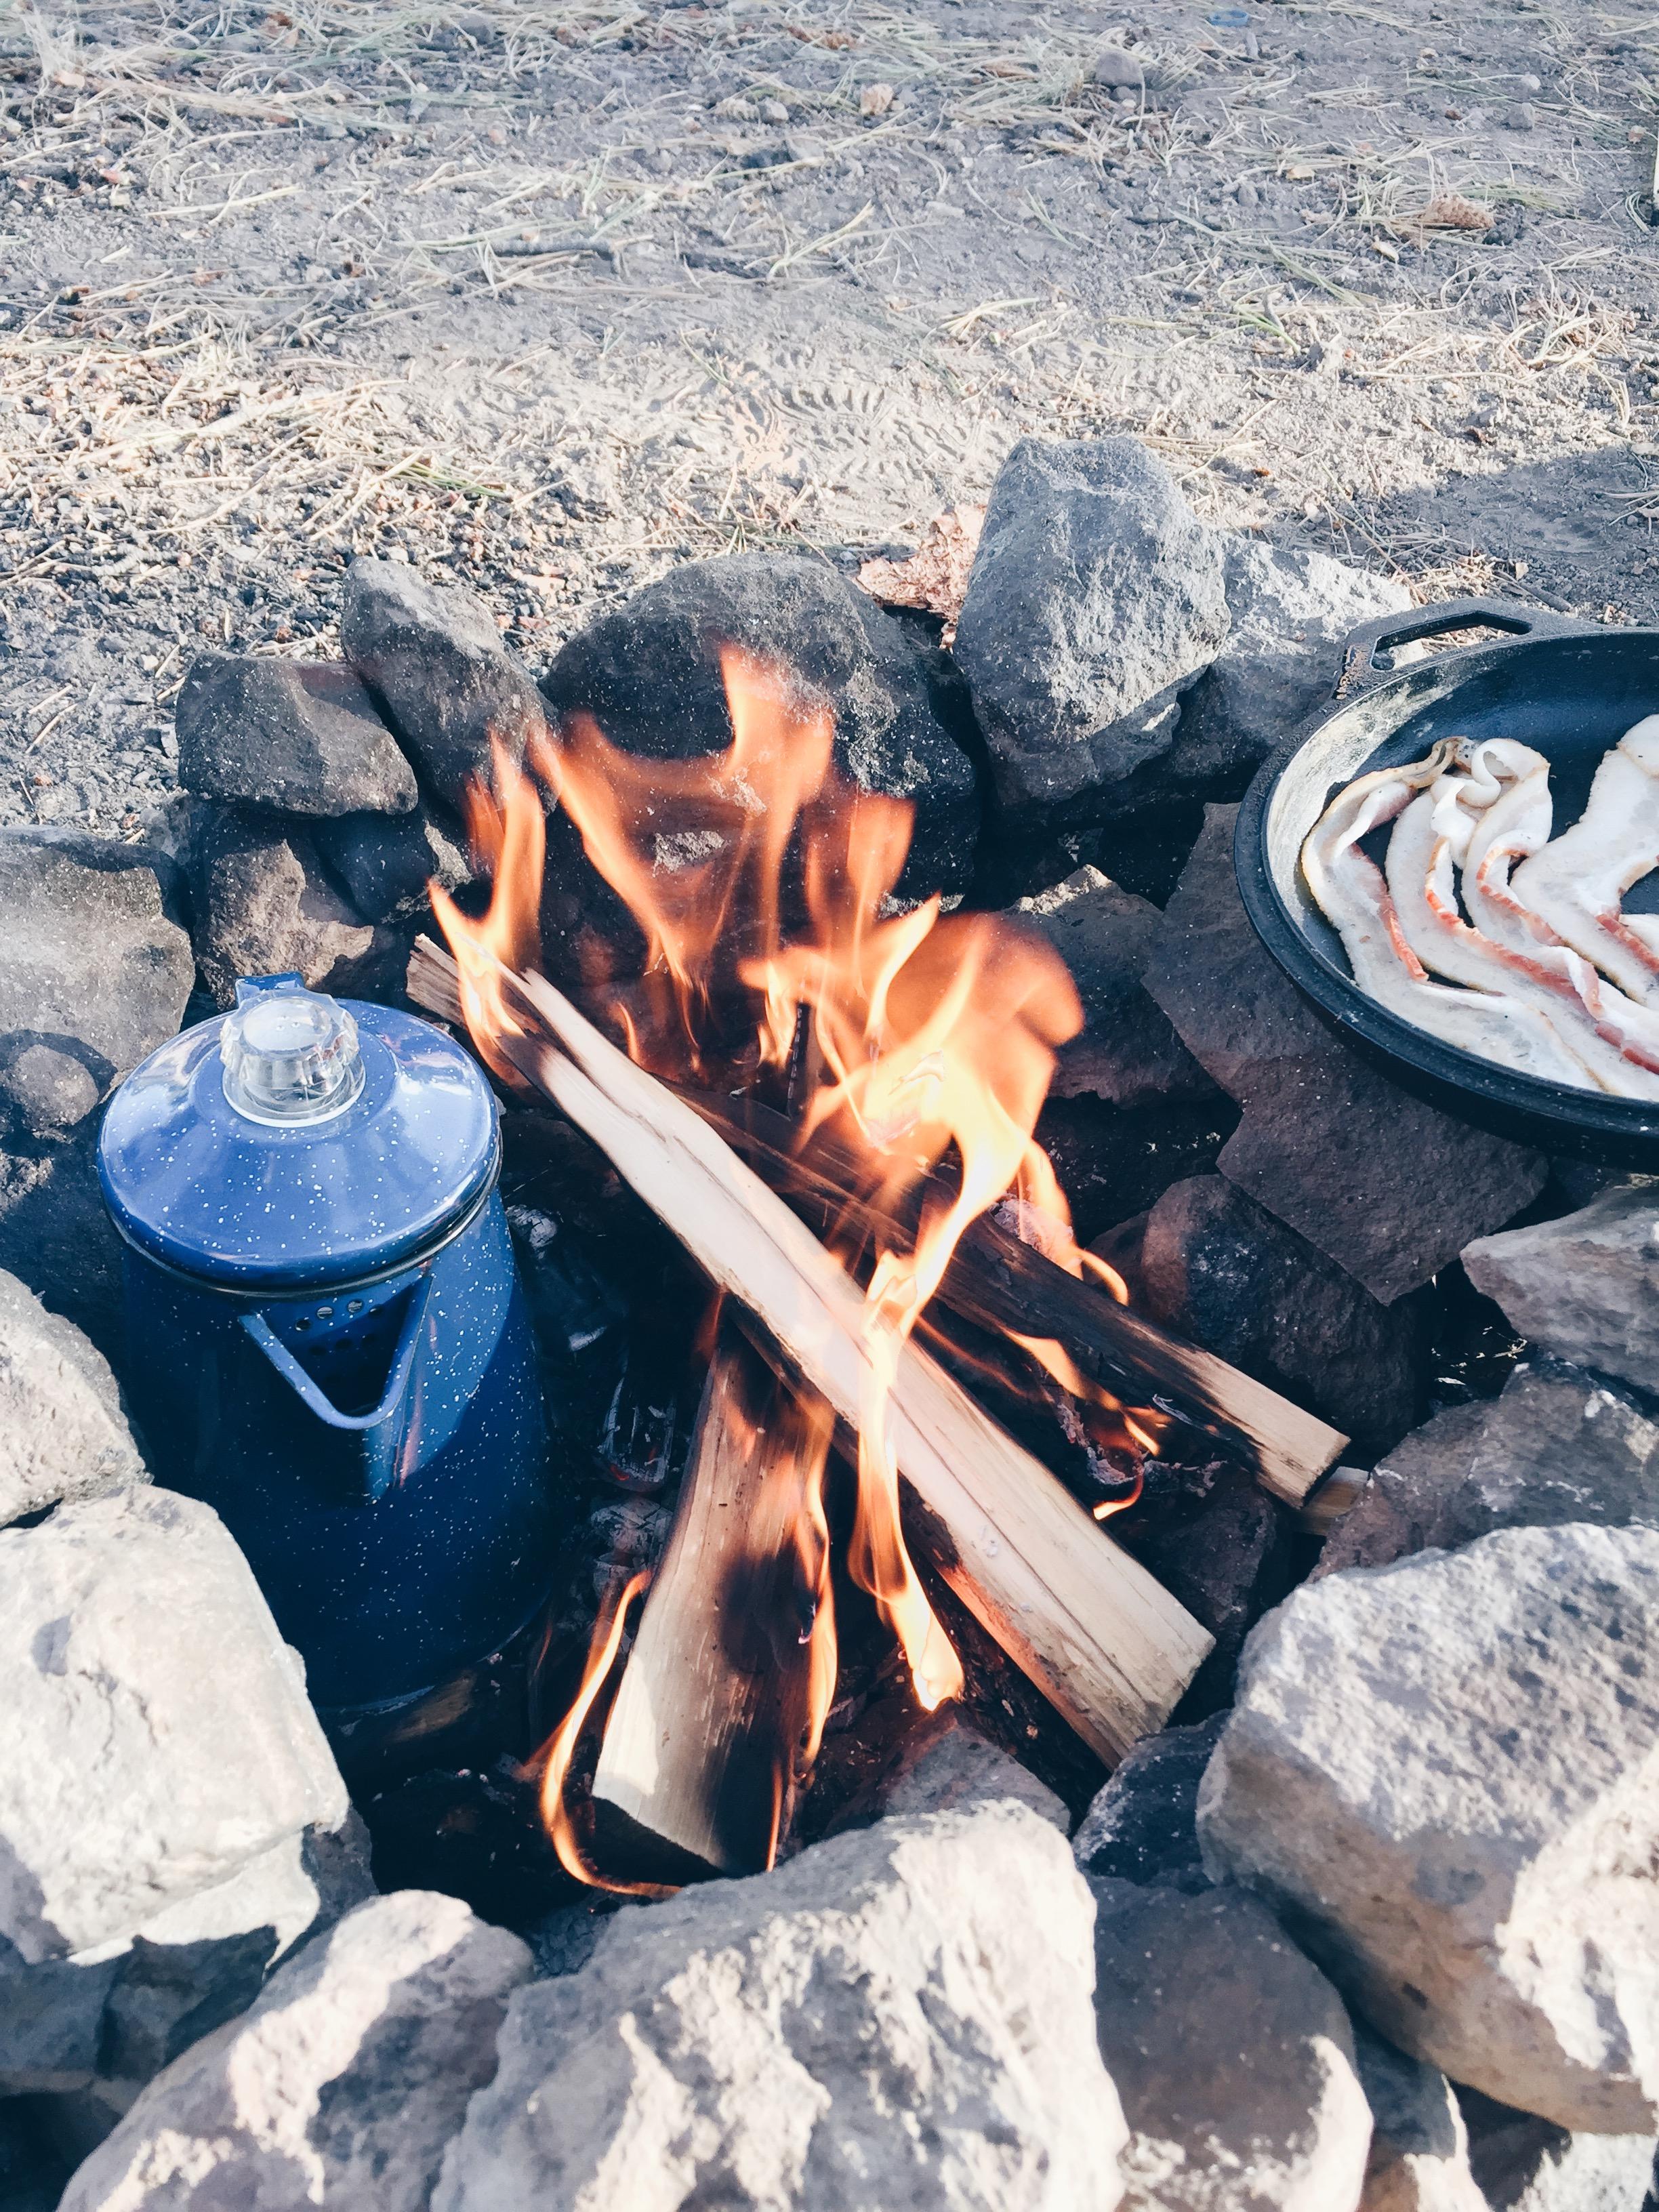 Breakfast - Temperature: 43°FOn the menu:  bacon  eggs  potatoes  coffee